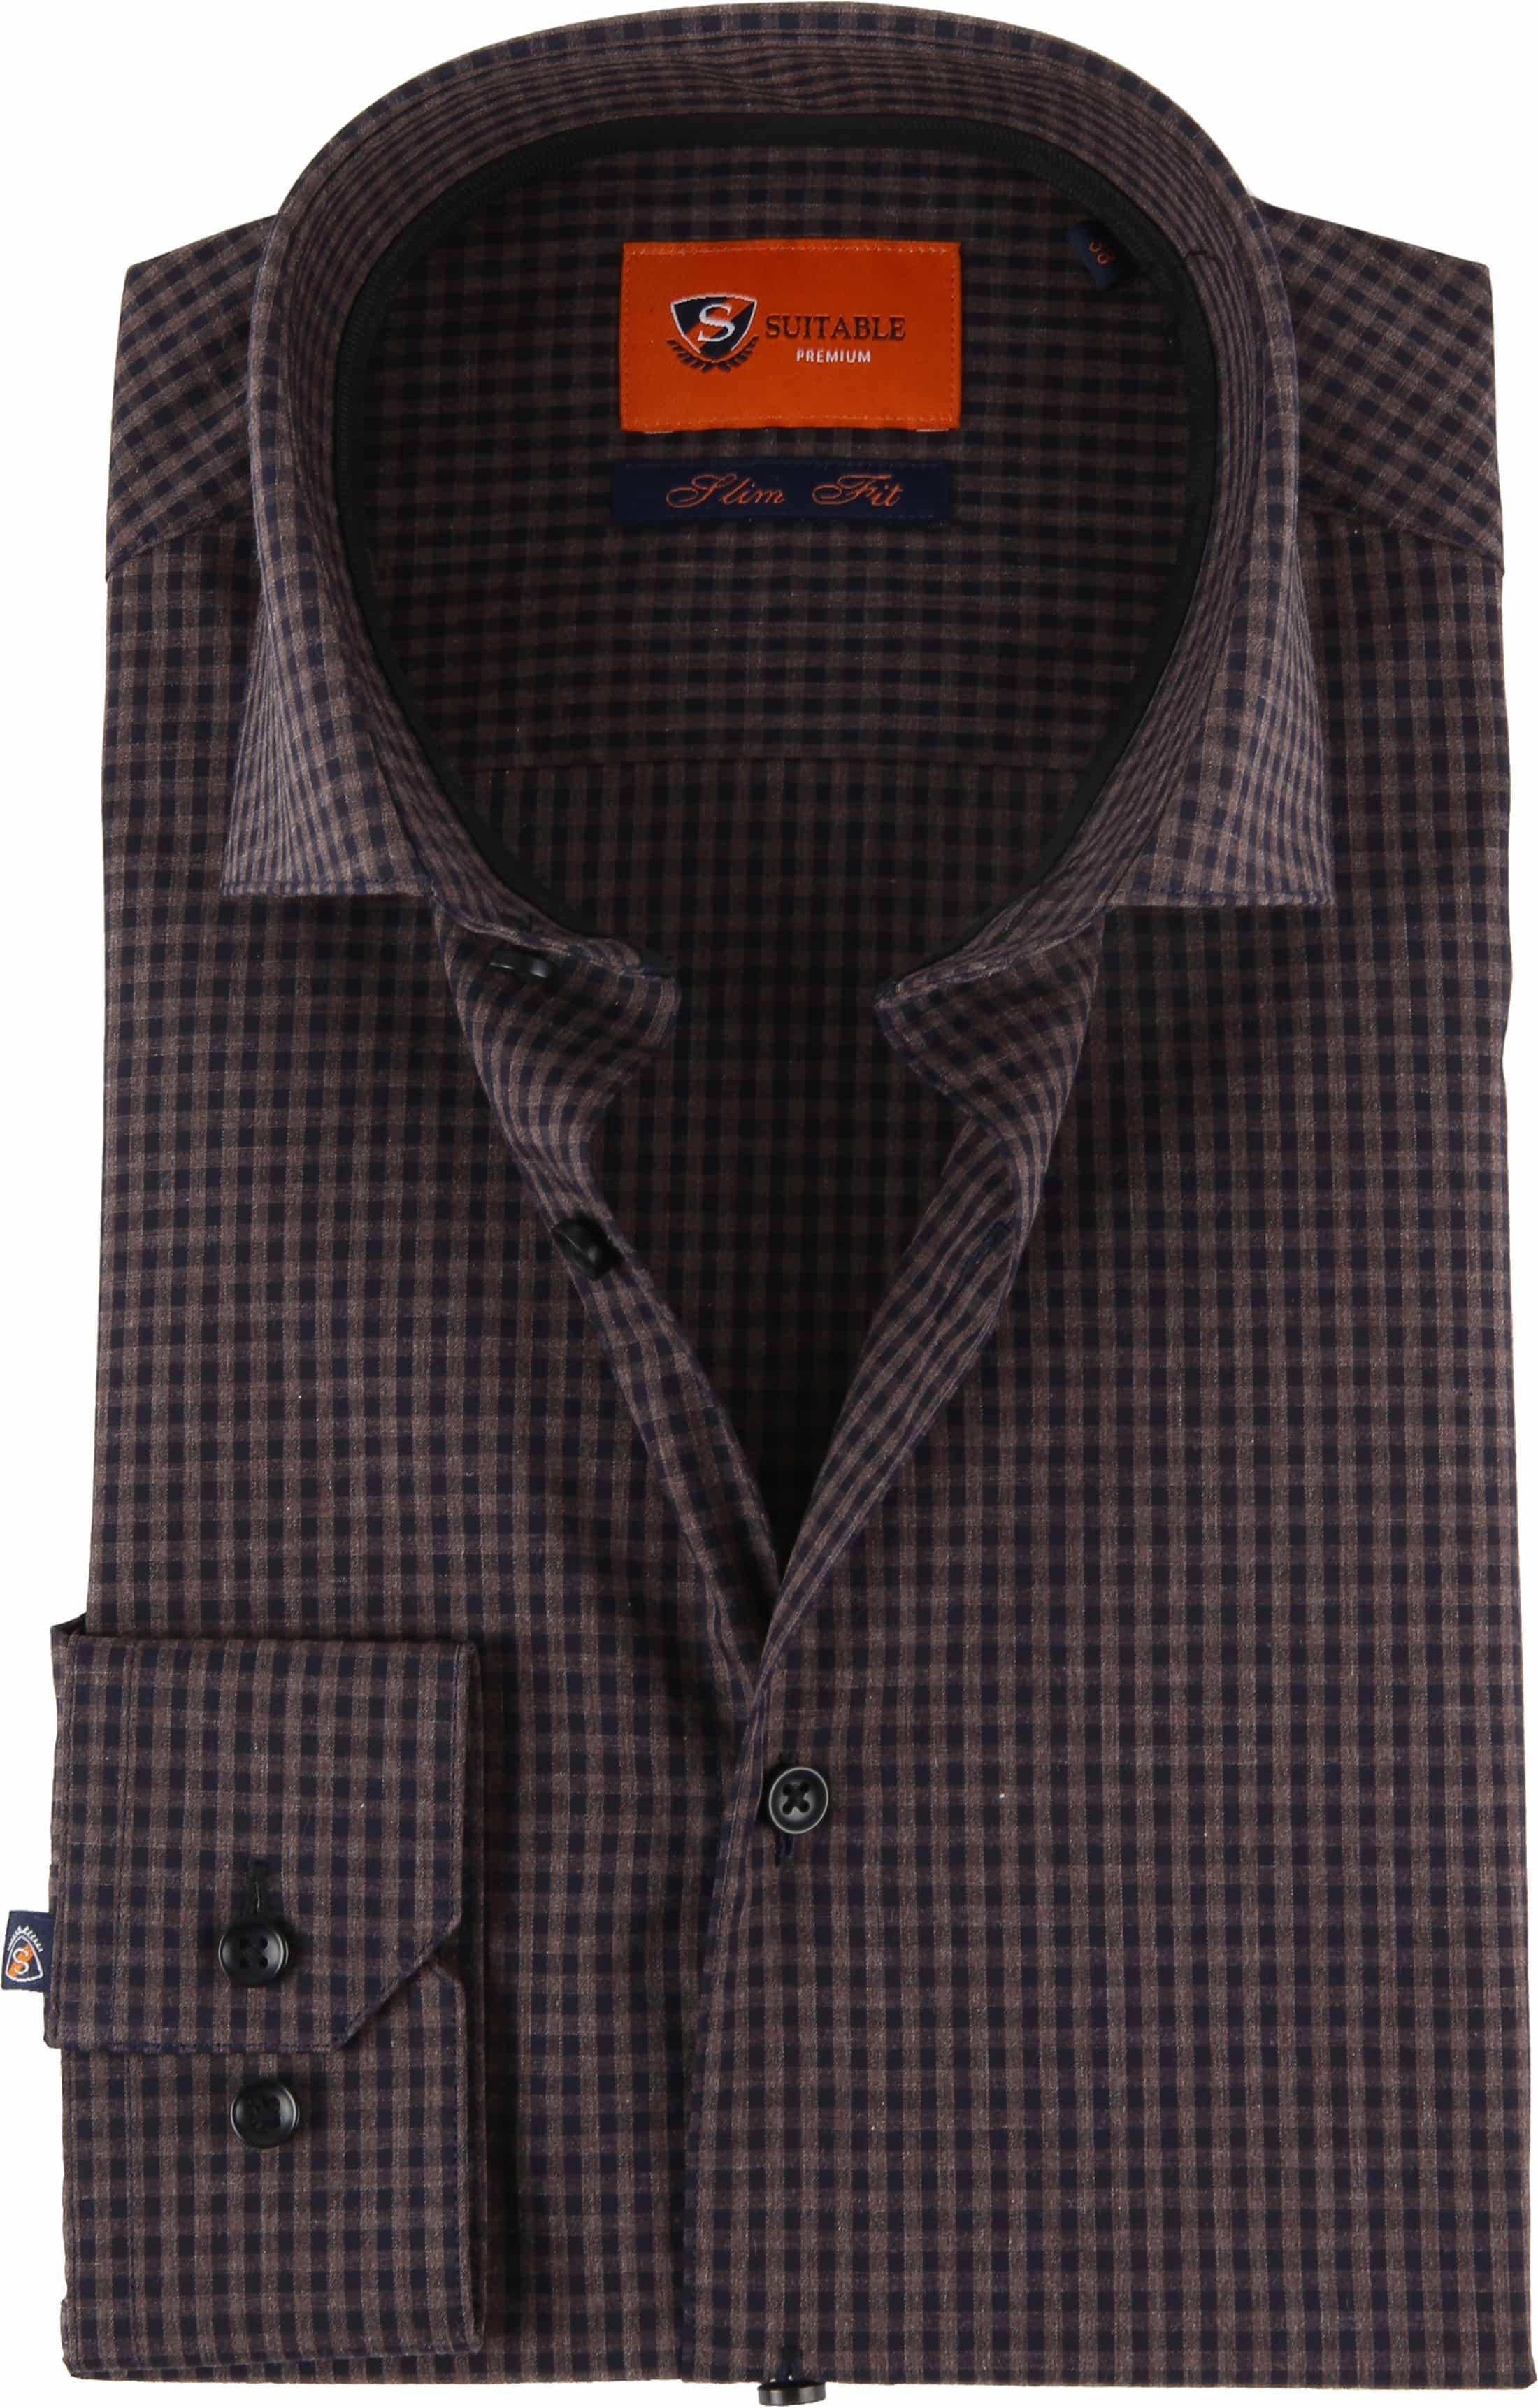 Suitable Overhemd Vichy Ruit Bruin foto 0